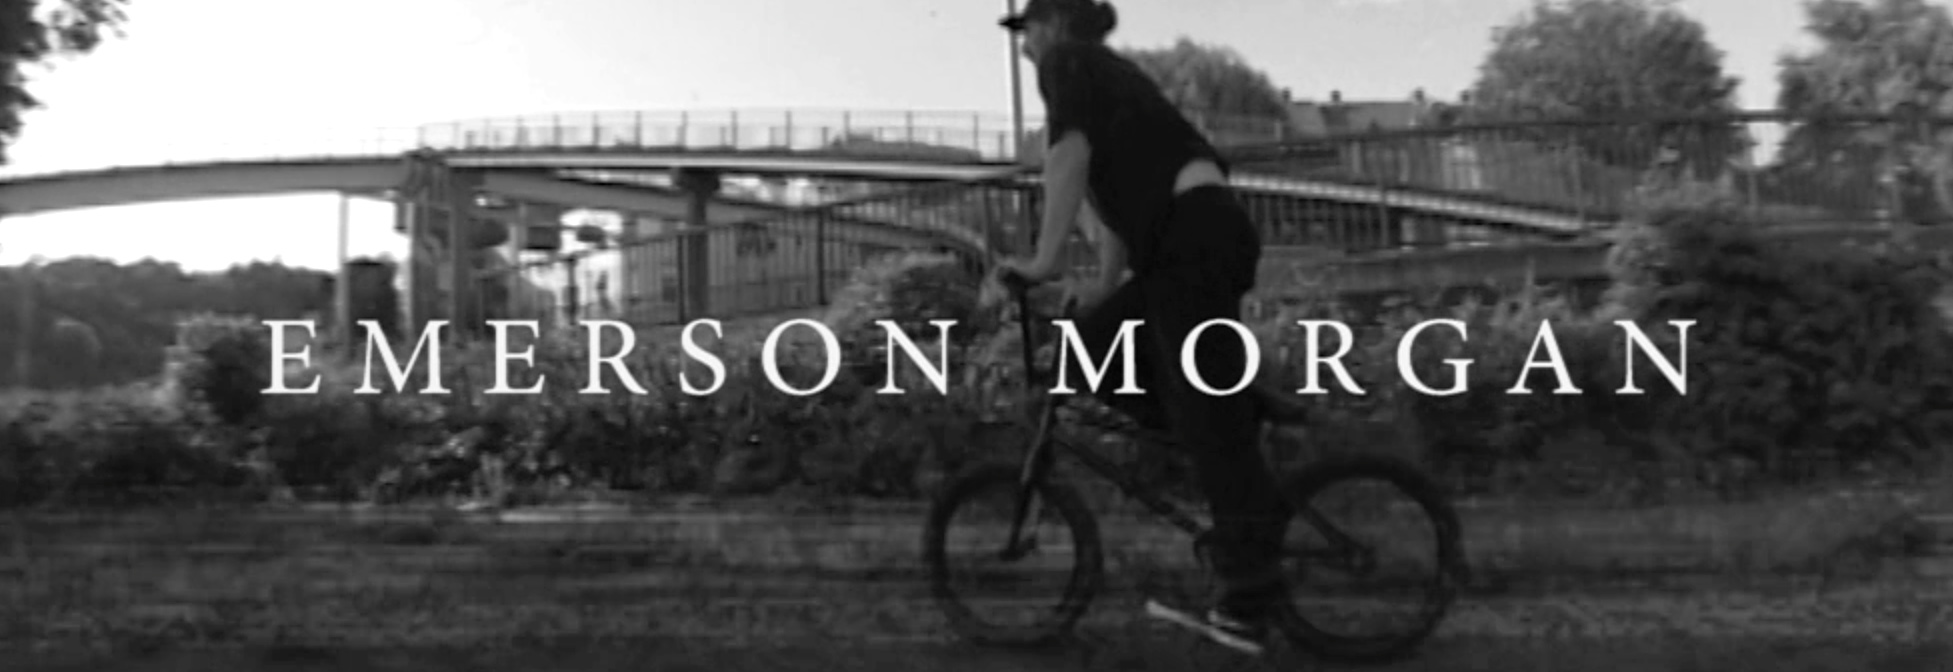 Crucial BMX X Subrosa X Seventies - Emerson Morgan 2016 Video